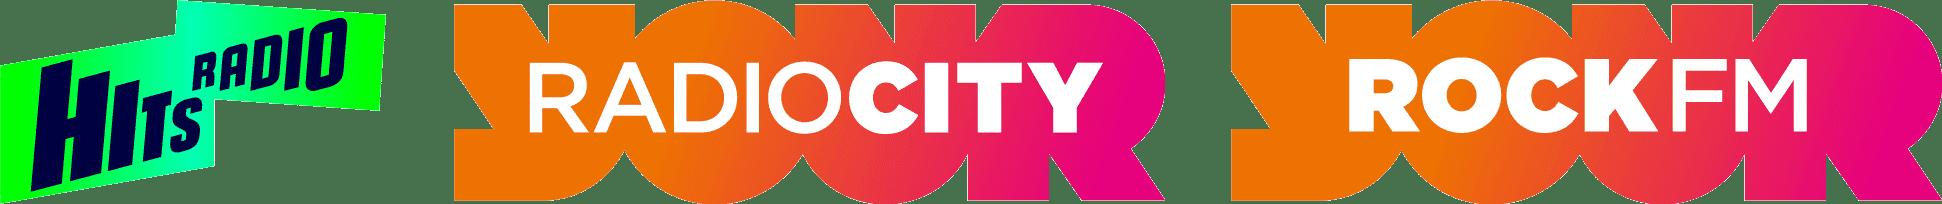 Hits Radio, Radio City, Rock FM